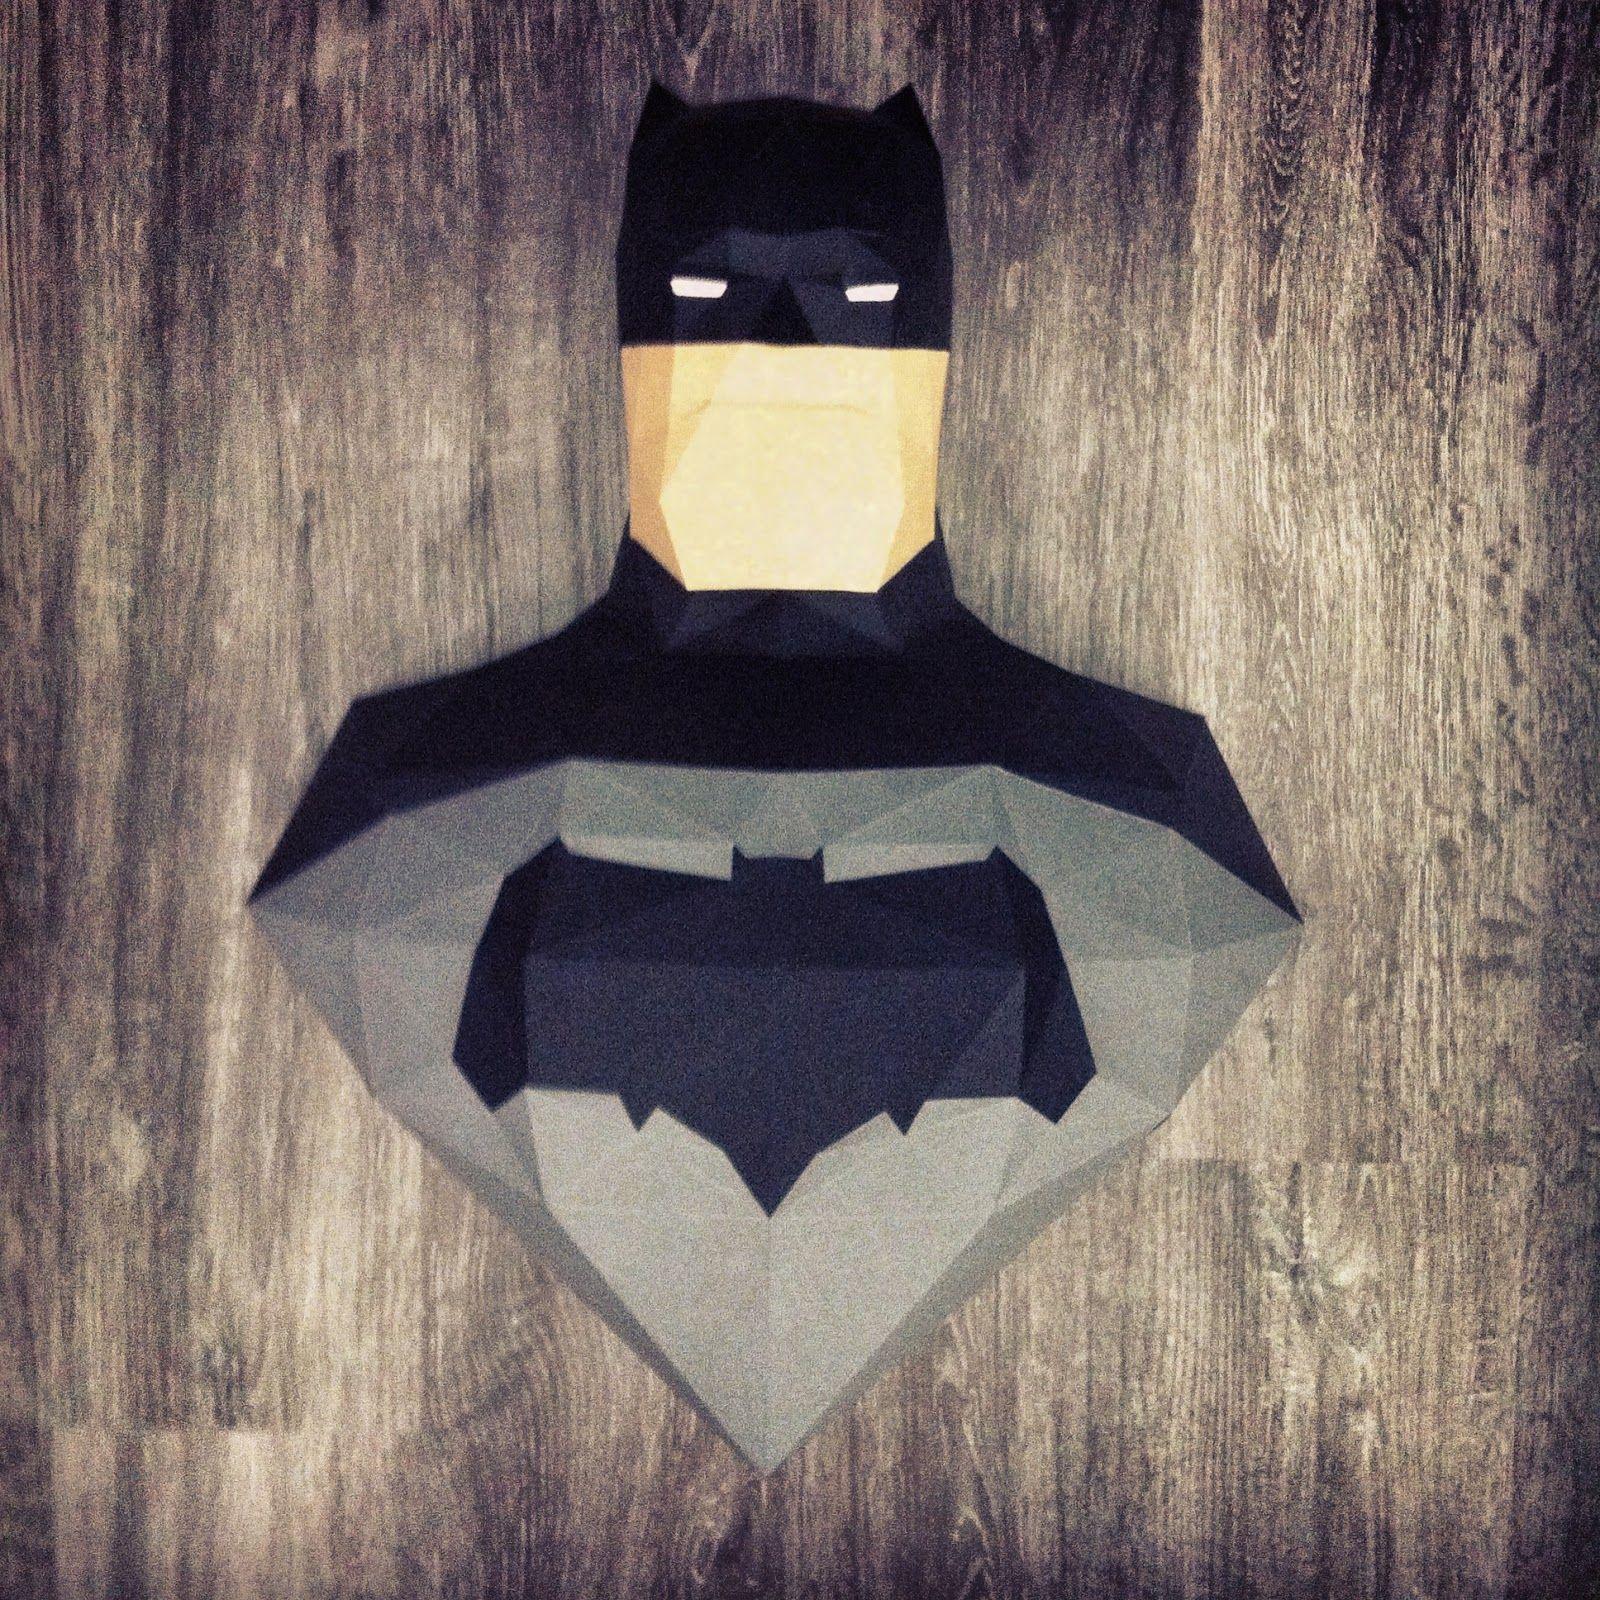 Sculpture Batman Dark Knight Returns en papier - Paper Batman Dark Knight Returns  Sculpture #paper #papier #papercut #papercraft #pepakura #design #vector #batman #thedarkknight #darkknight #darkknightreturns #batmanvsuperman #justiceleague #dawnofjustice #manofsteel #batfleck #benaffleck #dc #dccomics